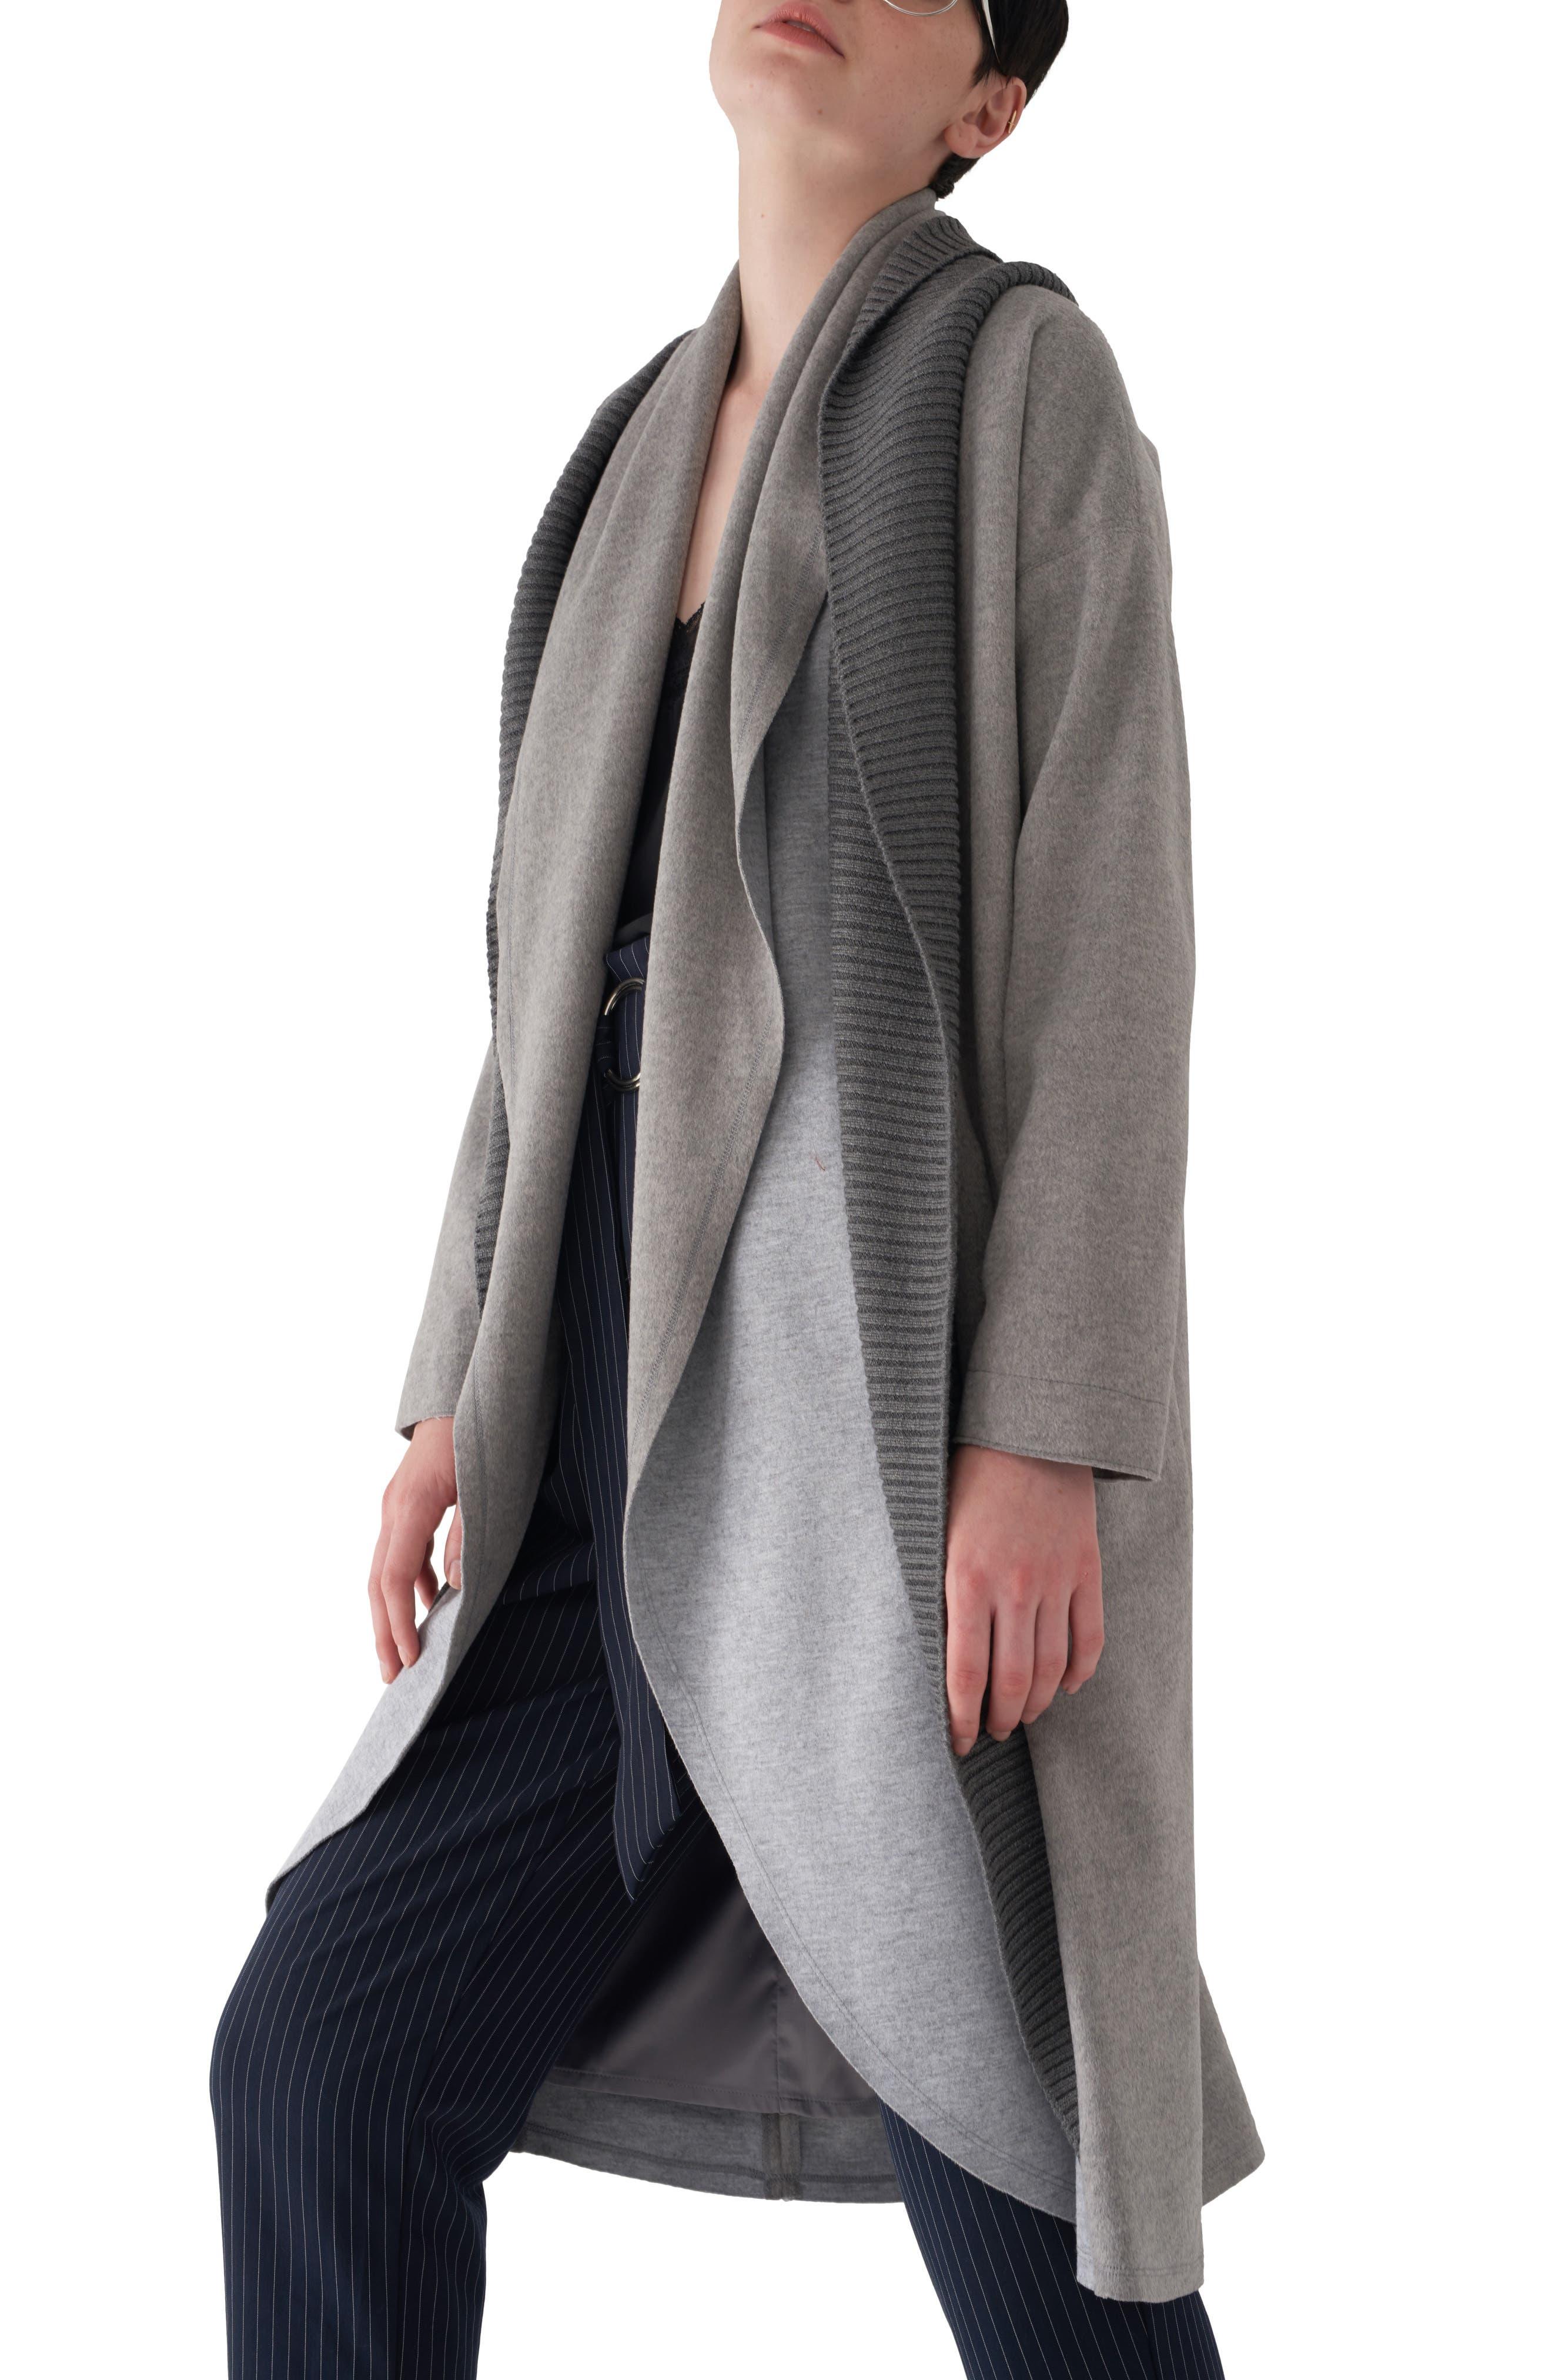 Brandy Stone Grey Duster Coat,                             Alternate thumbnail 3, color,                             GREY